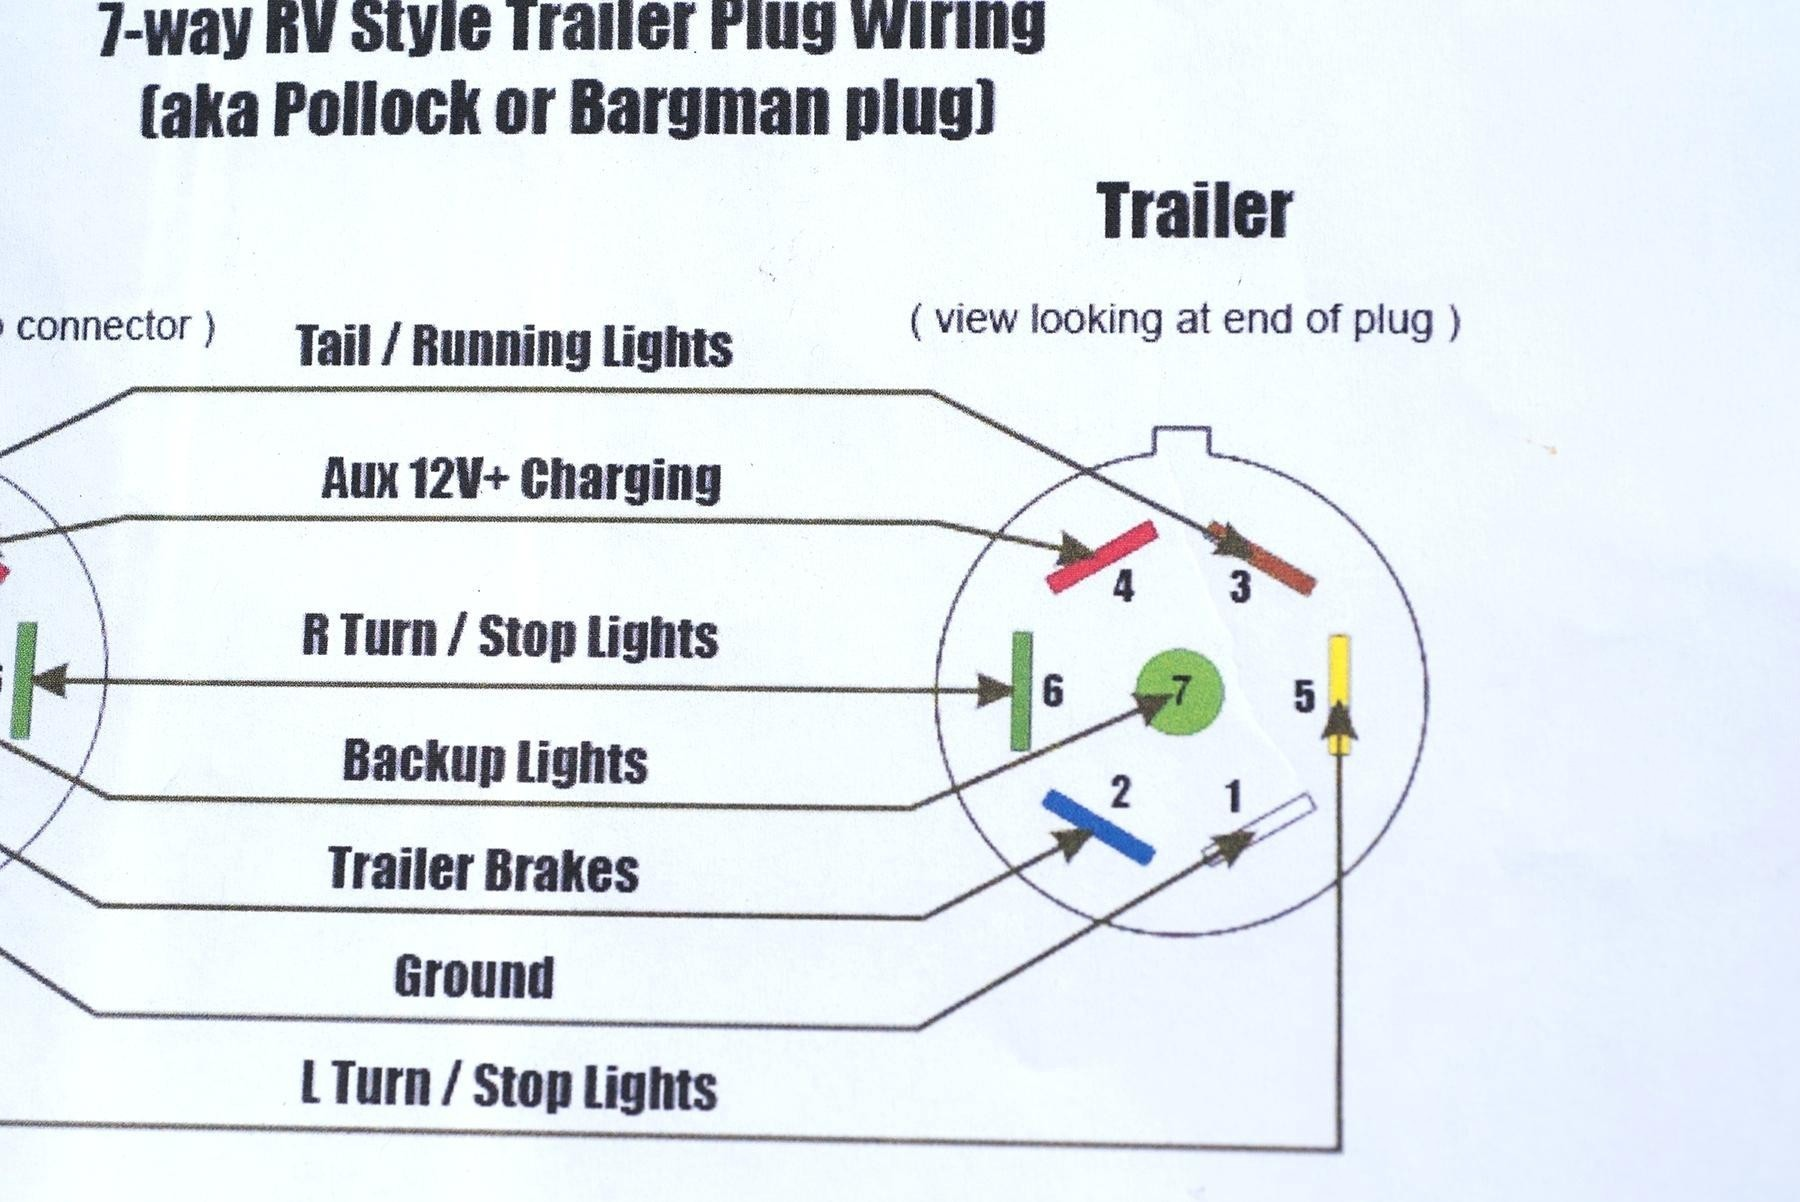 Trailer Light Wiring Diagram 7 Way 6 Round Adapter Plug Wire Diagram Wiring Diagram toolbox Of Trailer Light Wiring Diagram 7 Way Featherlite Trailers Wiring Diagrams Wiring Diagram Paper